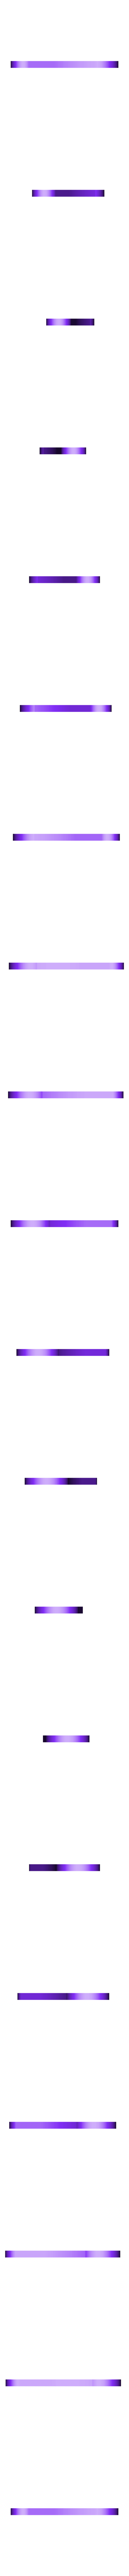 Rod_Connecting_6.3mm_Hole_2.2mm_thick.stl Download free STL file Hummingbird • 3D printing model, gzumwalt